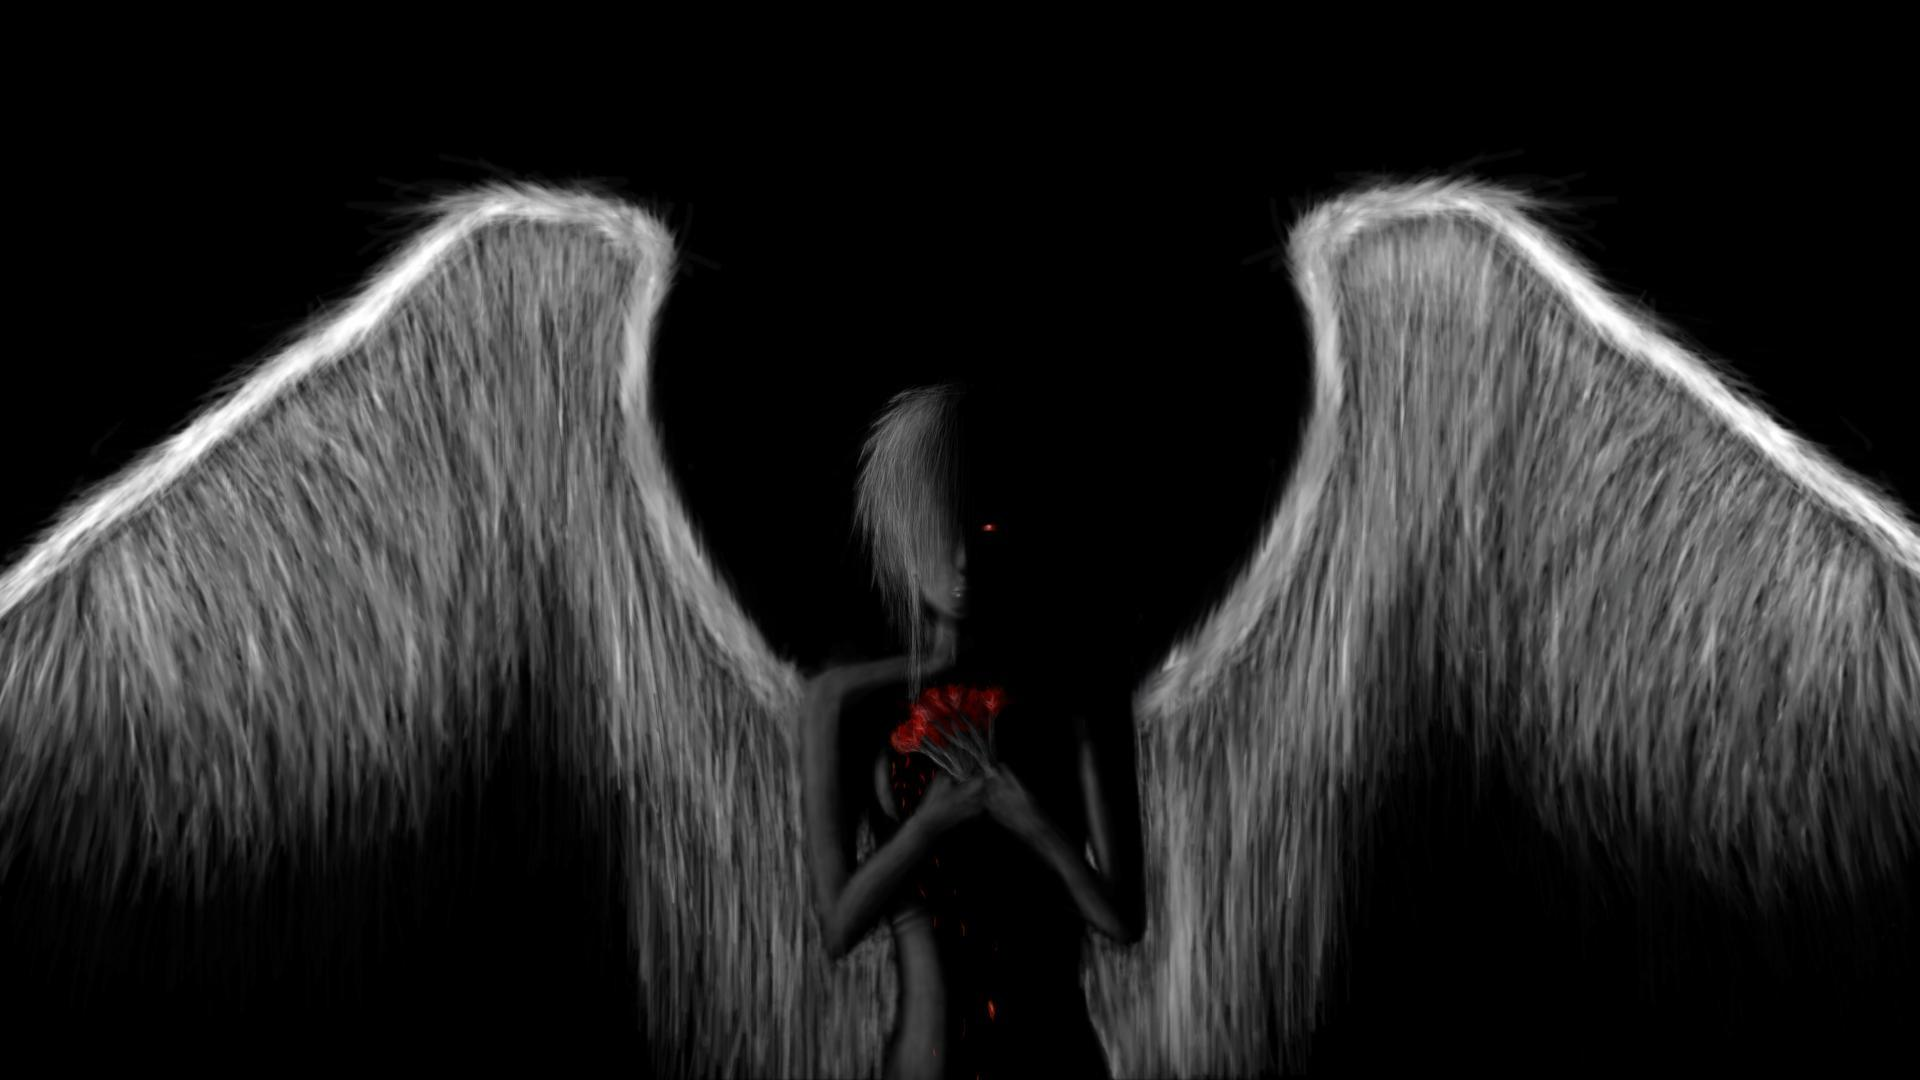 sexy fallen male angels wallpaper - photo #35